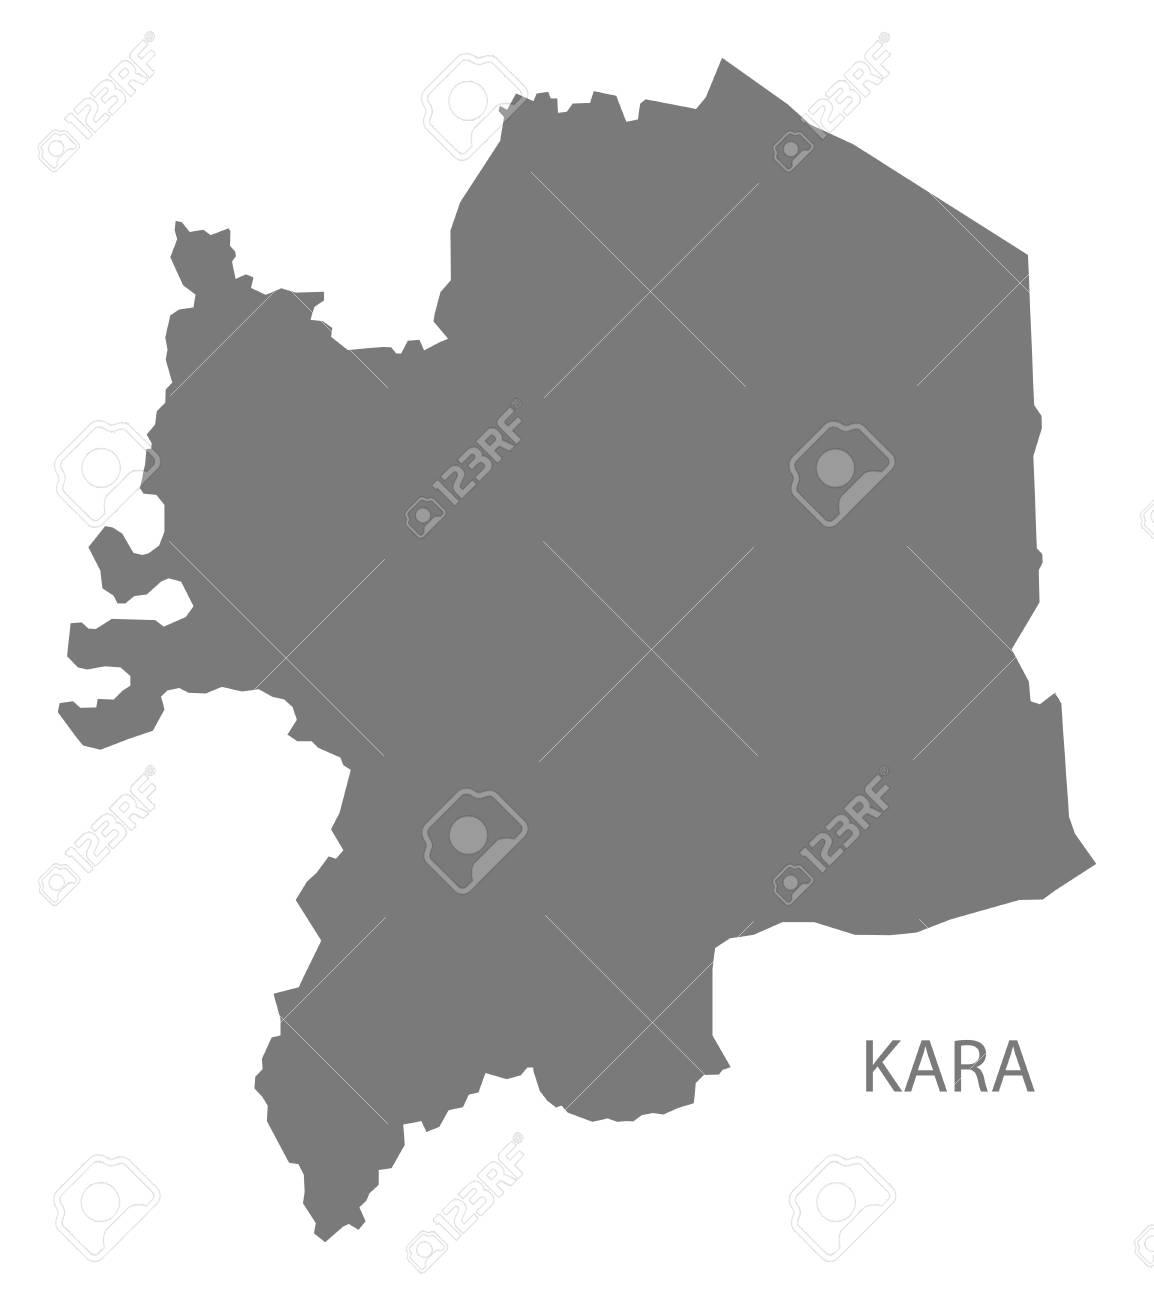 Kara map of Togo grey illustration shape